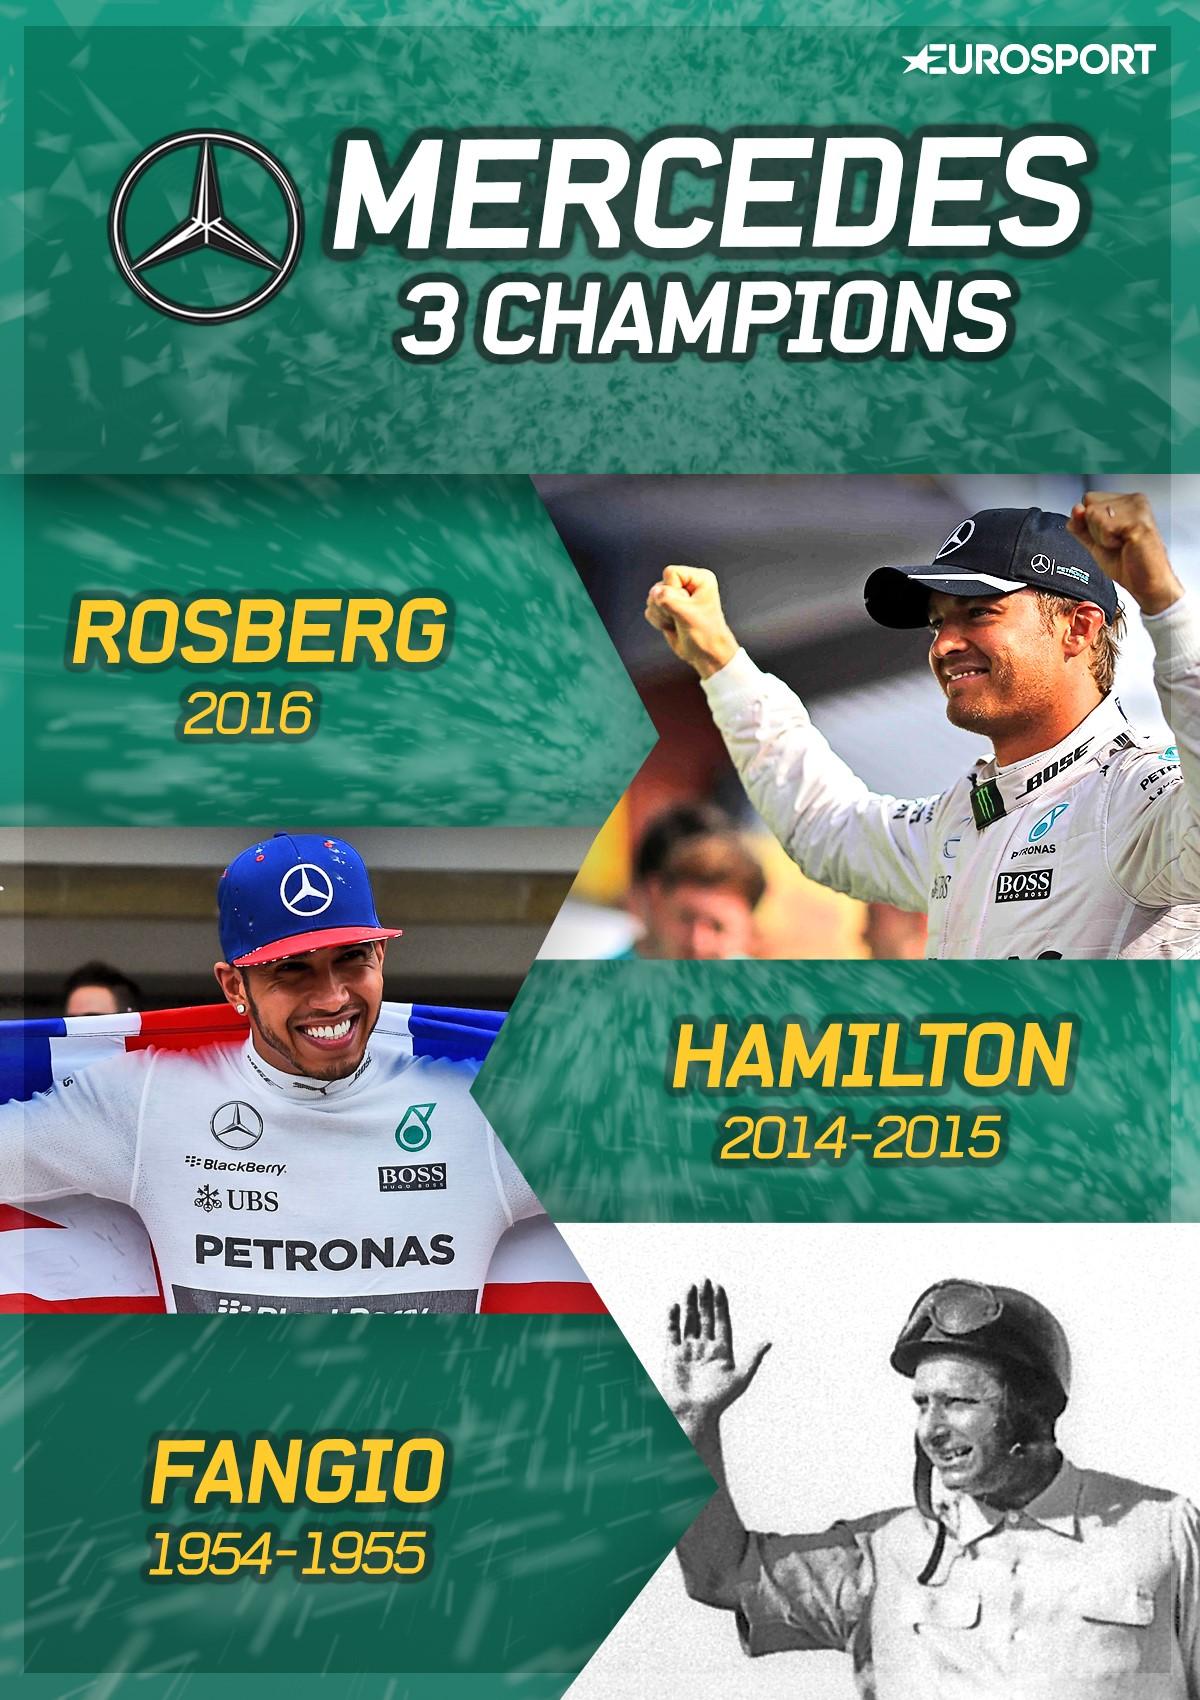 Rosberg, Hamilton, Fangio : Mercedes 3 champions